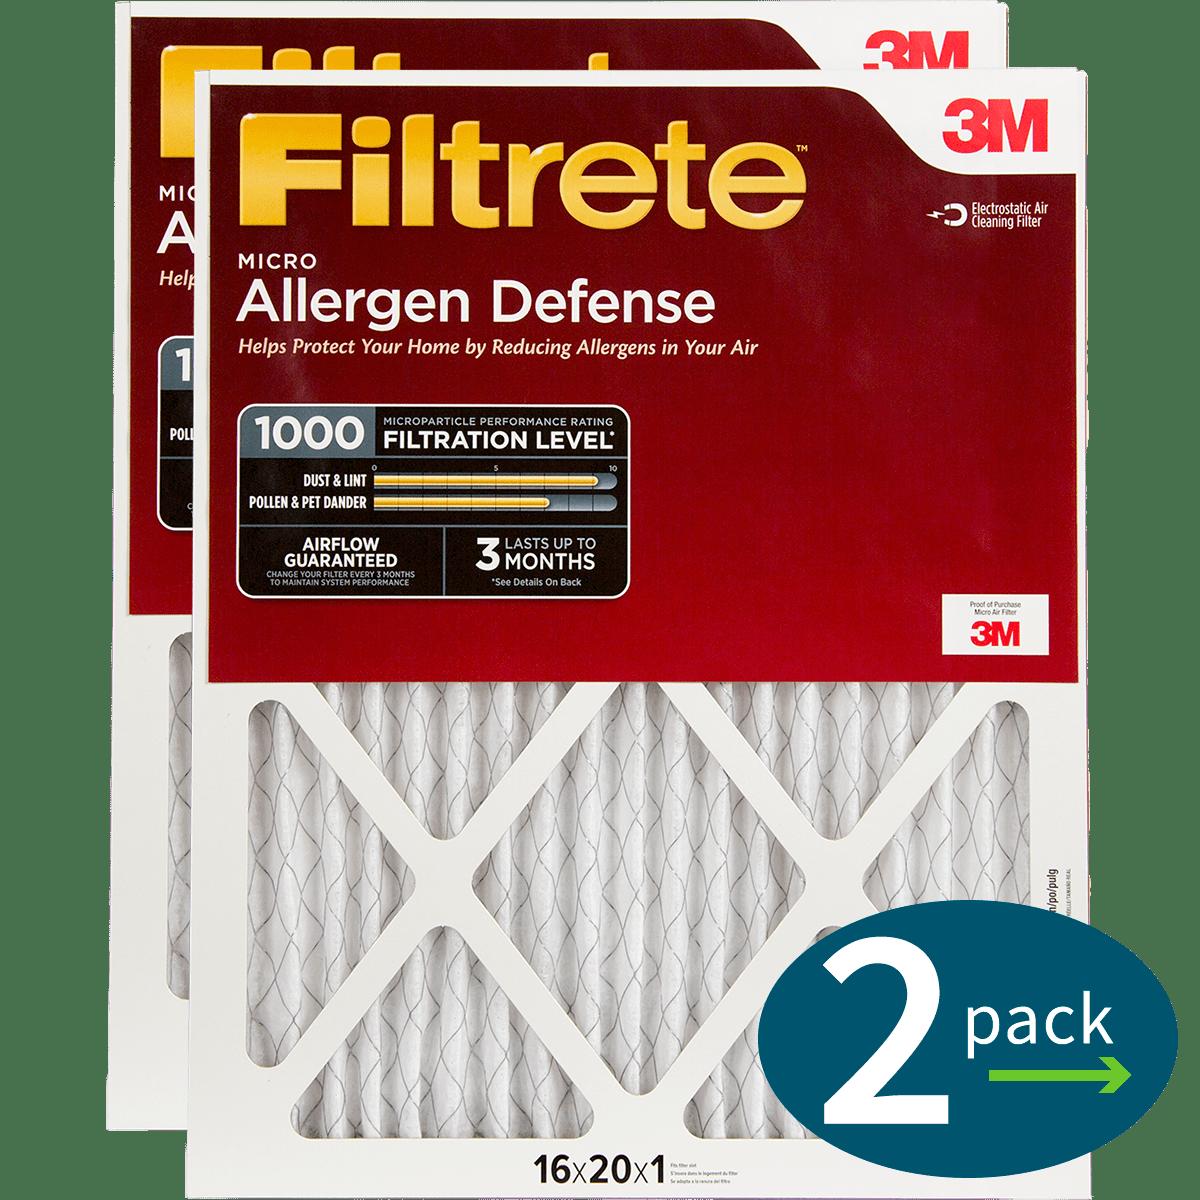 3m Filtrete 1-inch Micro Allergen Defense Mpr 1000 Air Filters - 2 Pack